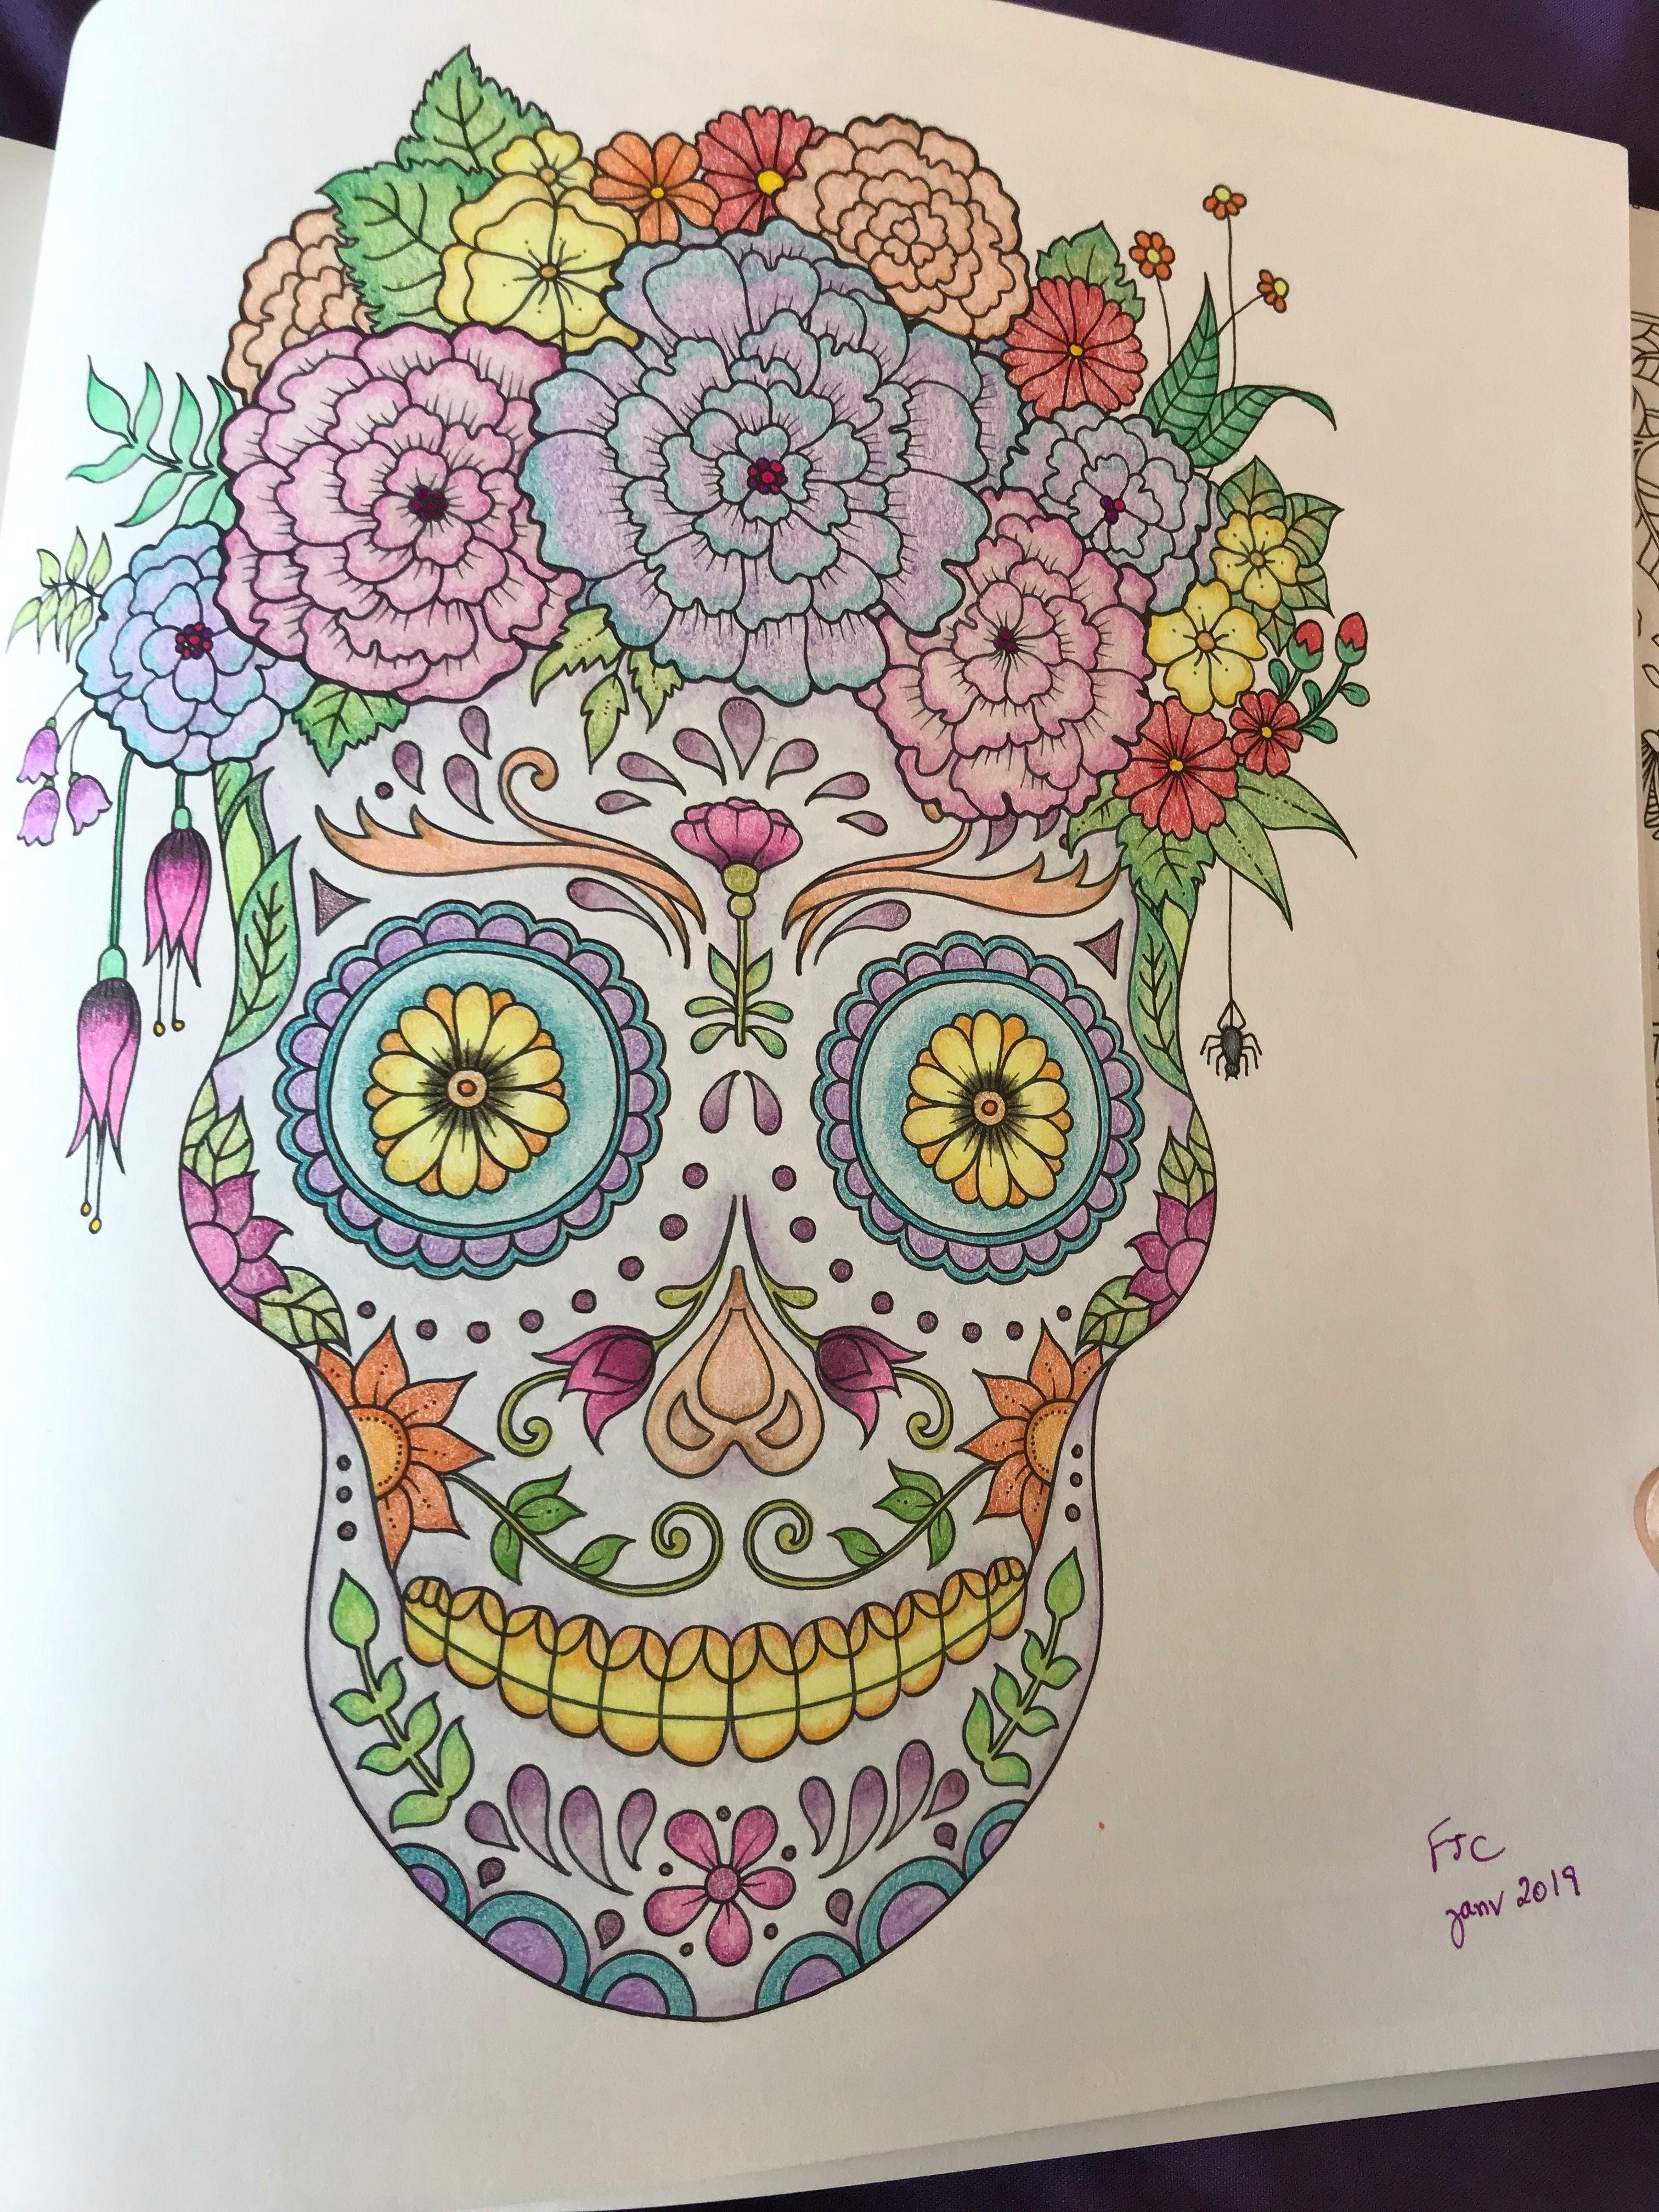 World of flowers by Johanna Basford | Johanna basford ...